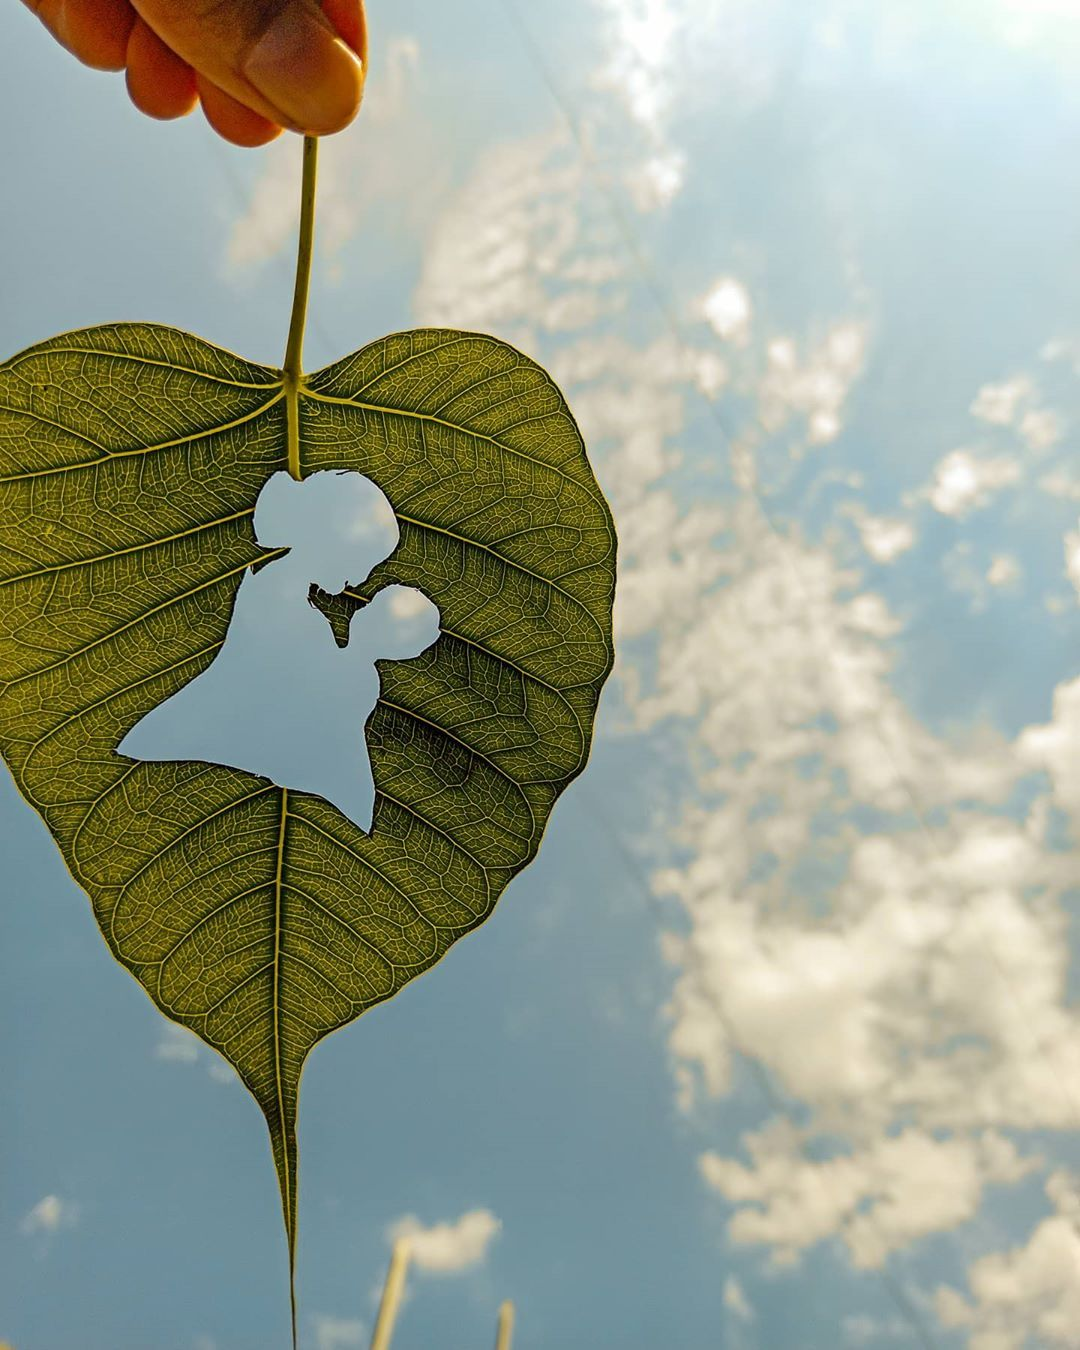 "ᴰⁱᵍⁱᵗᵃˡ ᵃʳᵗⁱˢᵗ on Instagram: "". 》》》》 ।। मां ।। 》》》》 . . . . #mom #mummy #ma #leaf #nature #green #sun #light #Bayern #reflections#Worldbestgram #photographers_of_india…"""